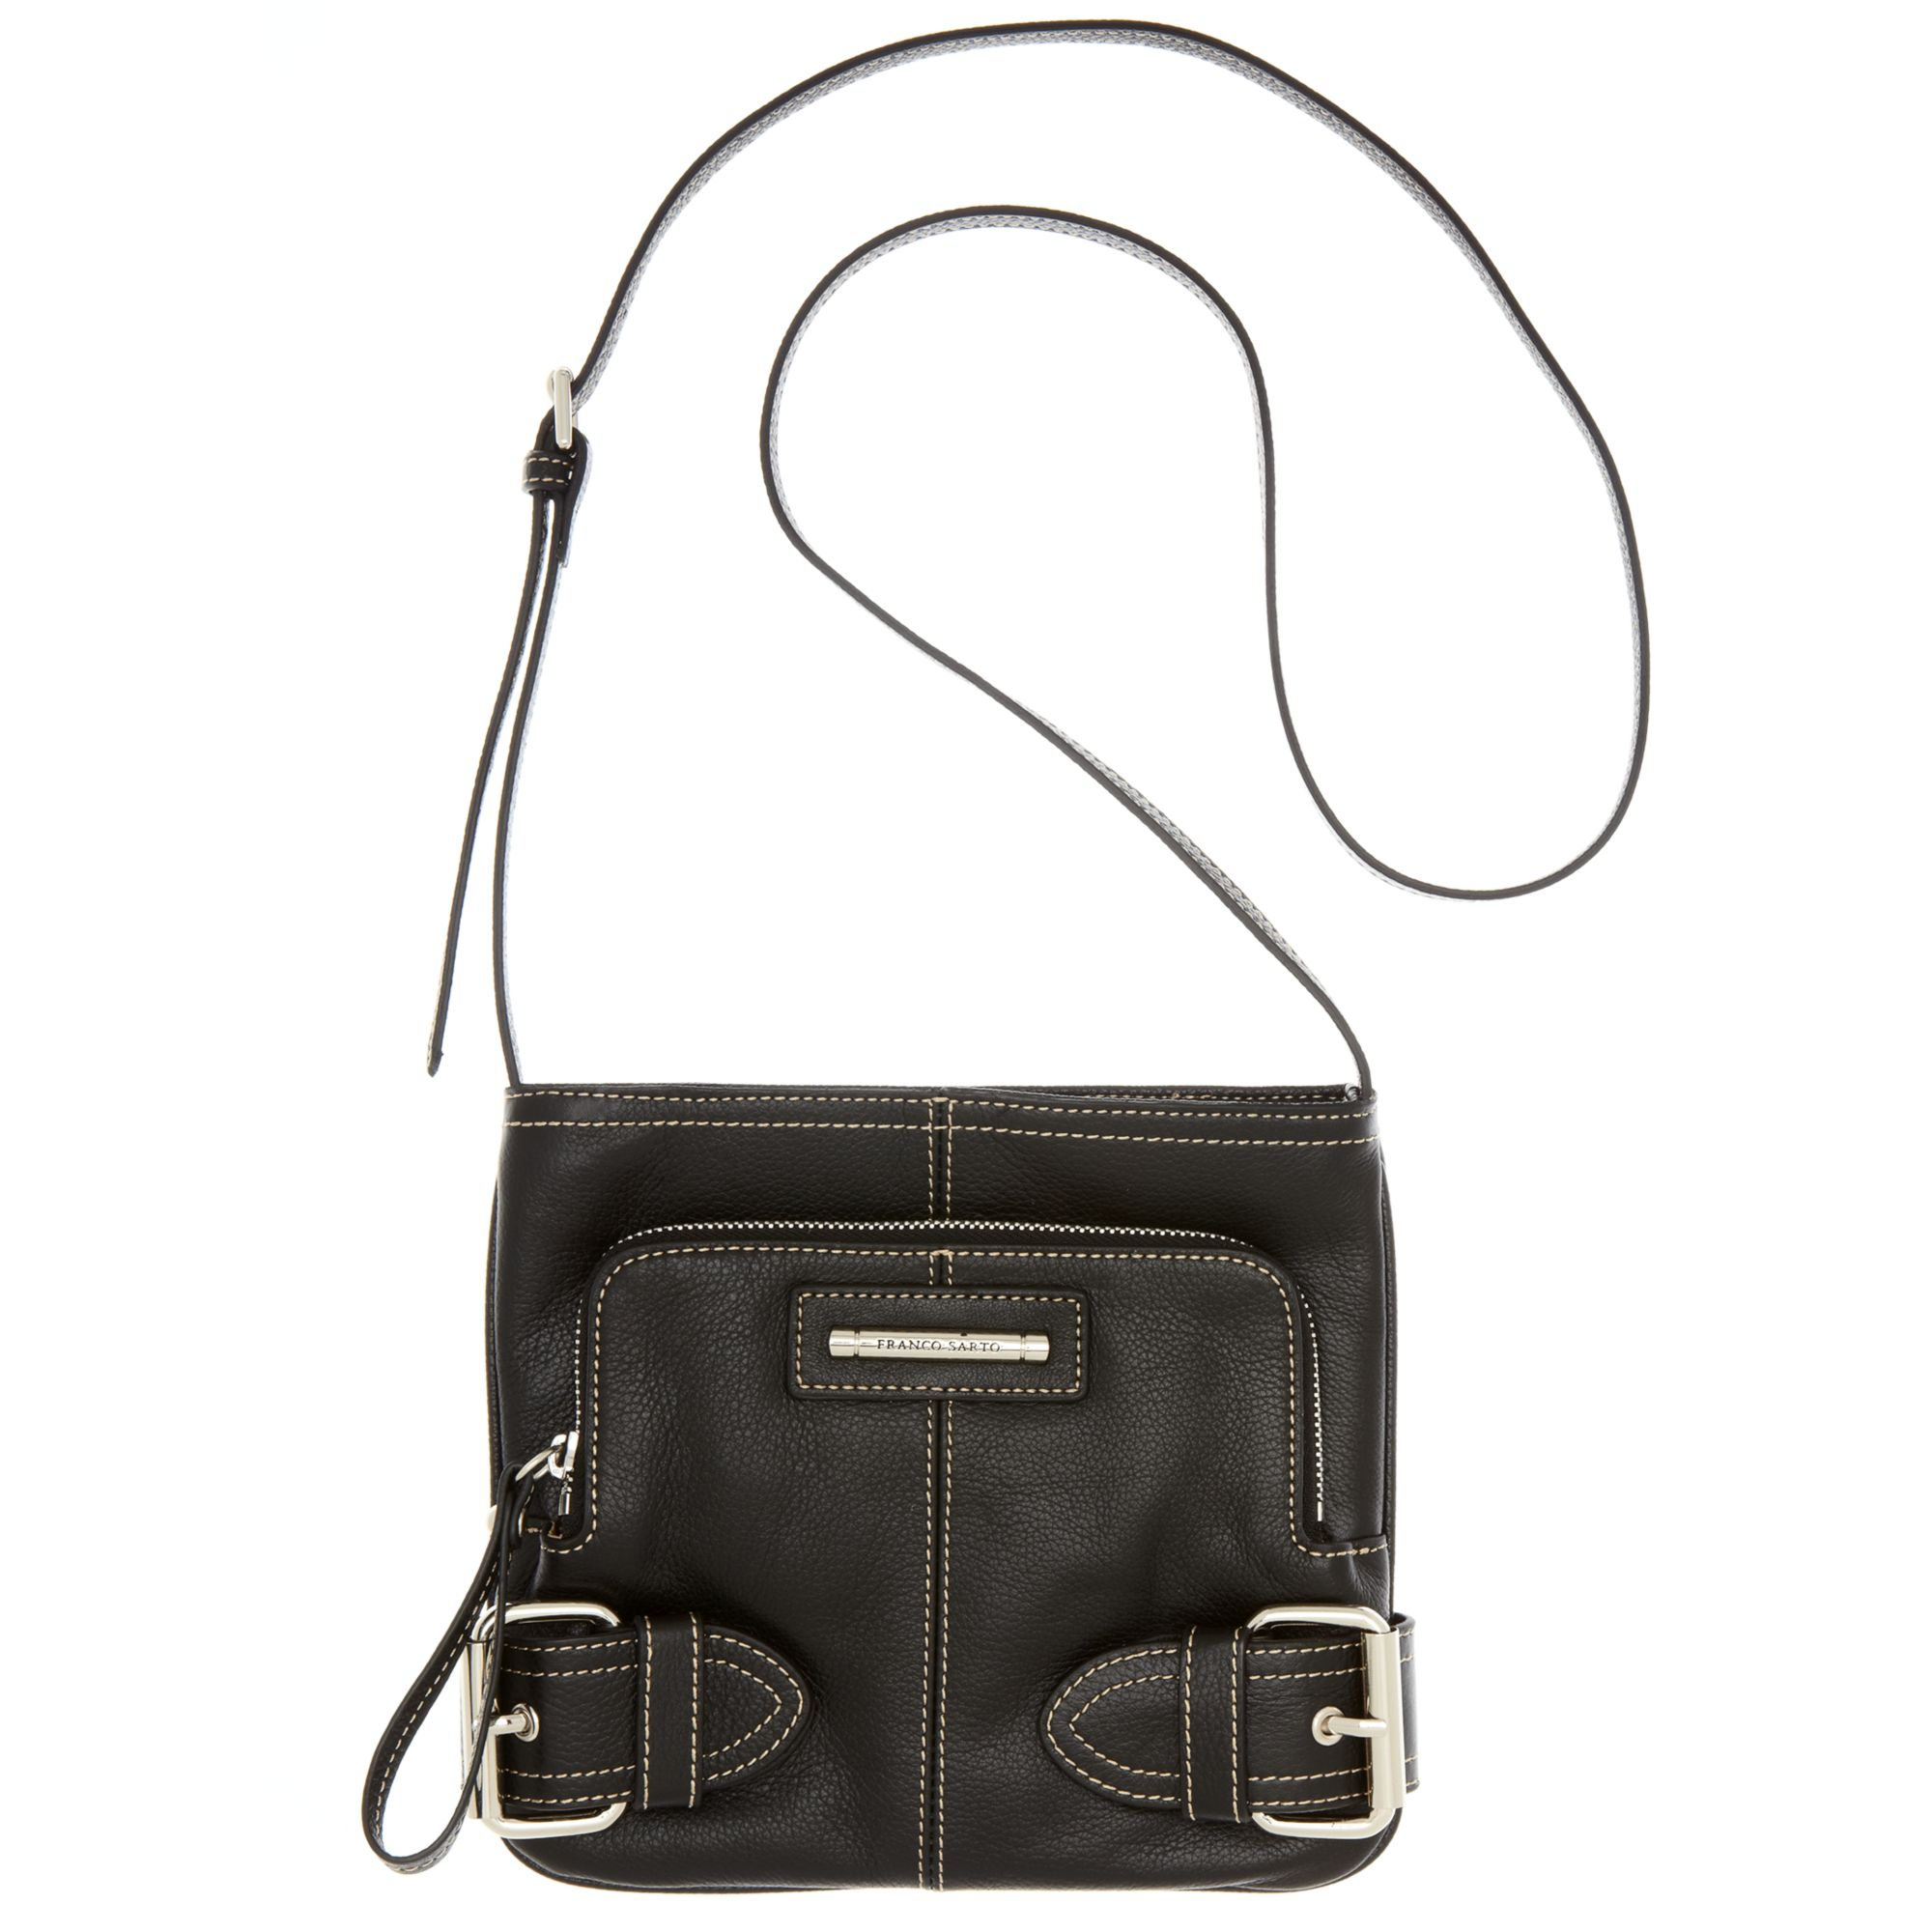 e5f59cd40975 Lyst - Franco Sarto Jolie Leather Crossbody in Black